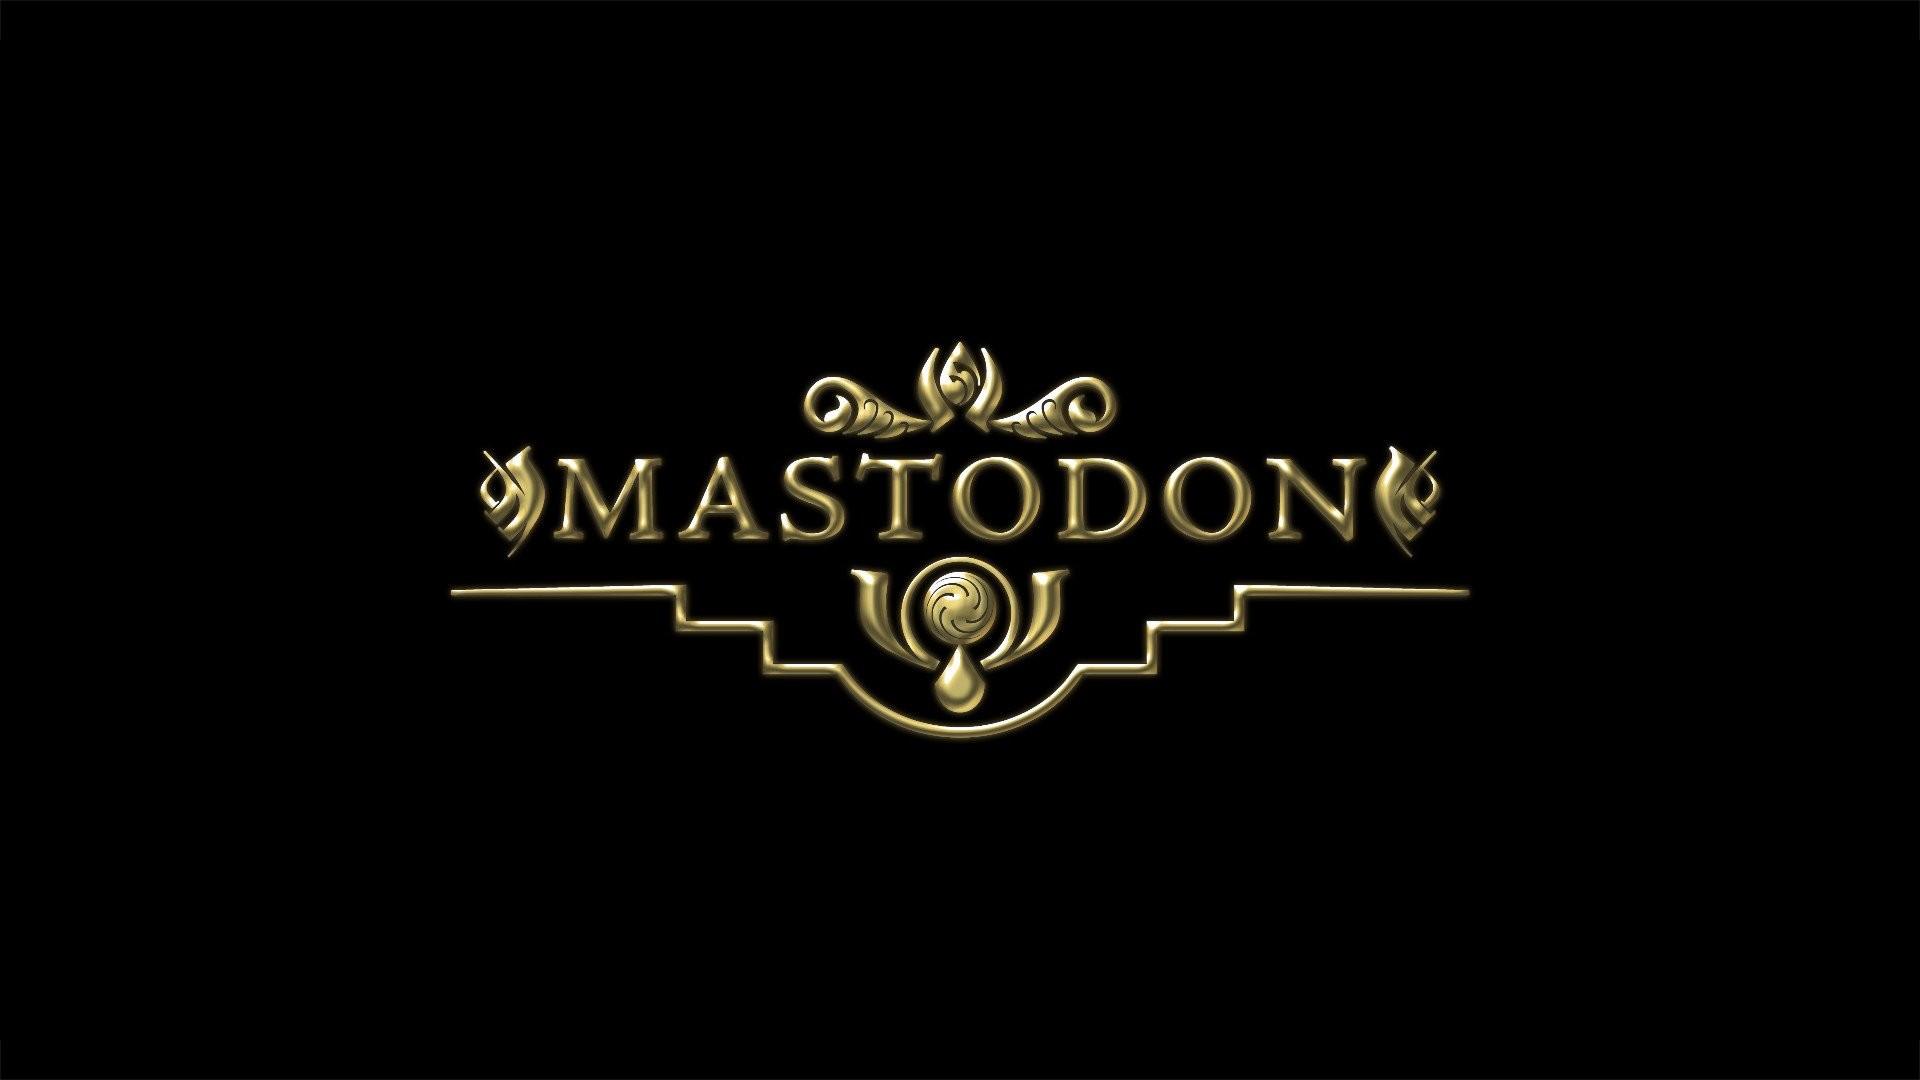 MASTODON sludge metal progressive heavy wallpaper | | 491926 |  WallpaperUP